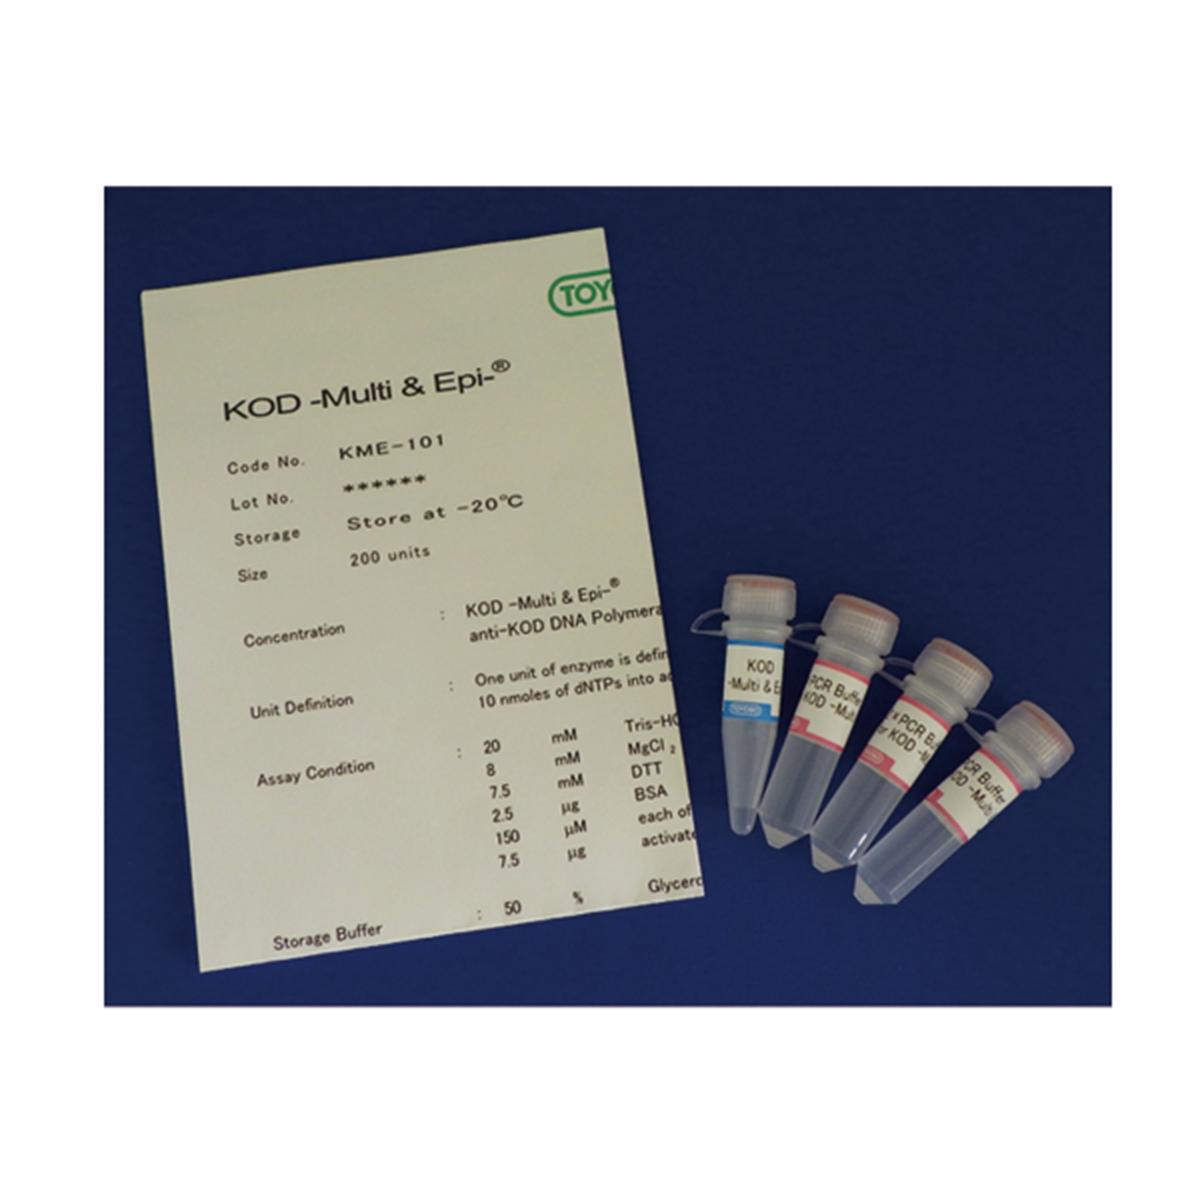 KOD -Multi & Epi-, high fidelity PCR enzyme for routine PCR